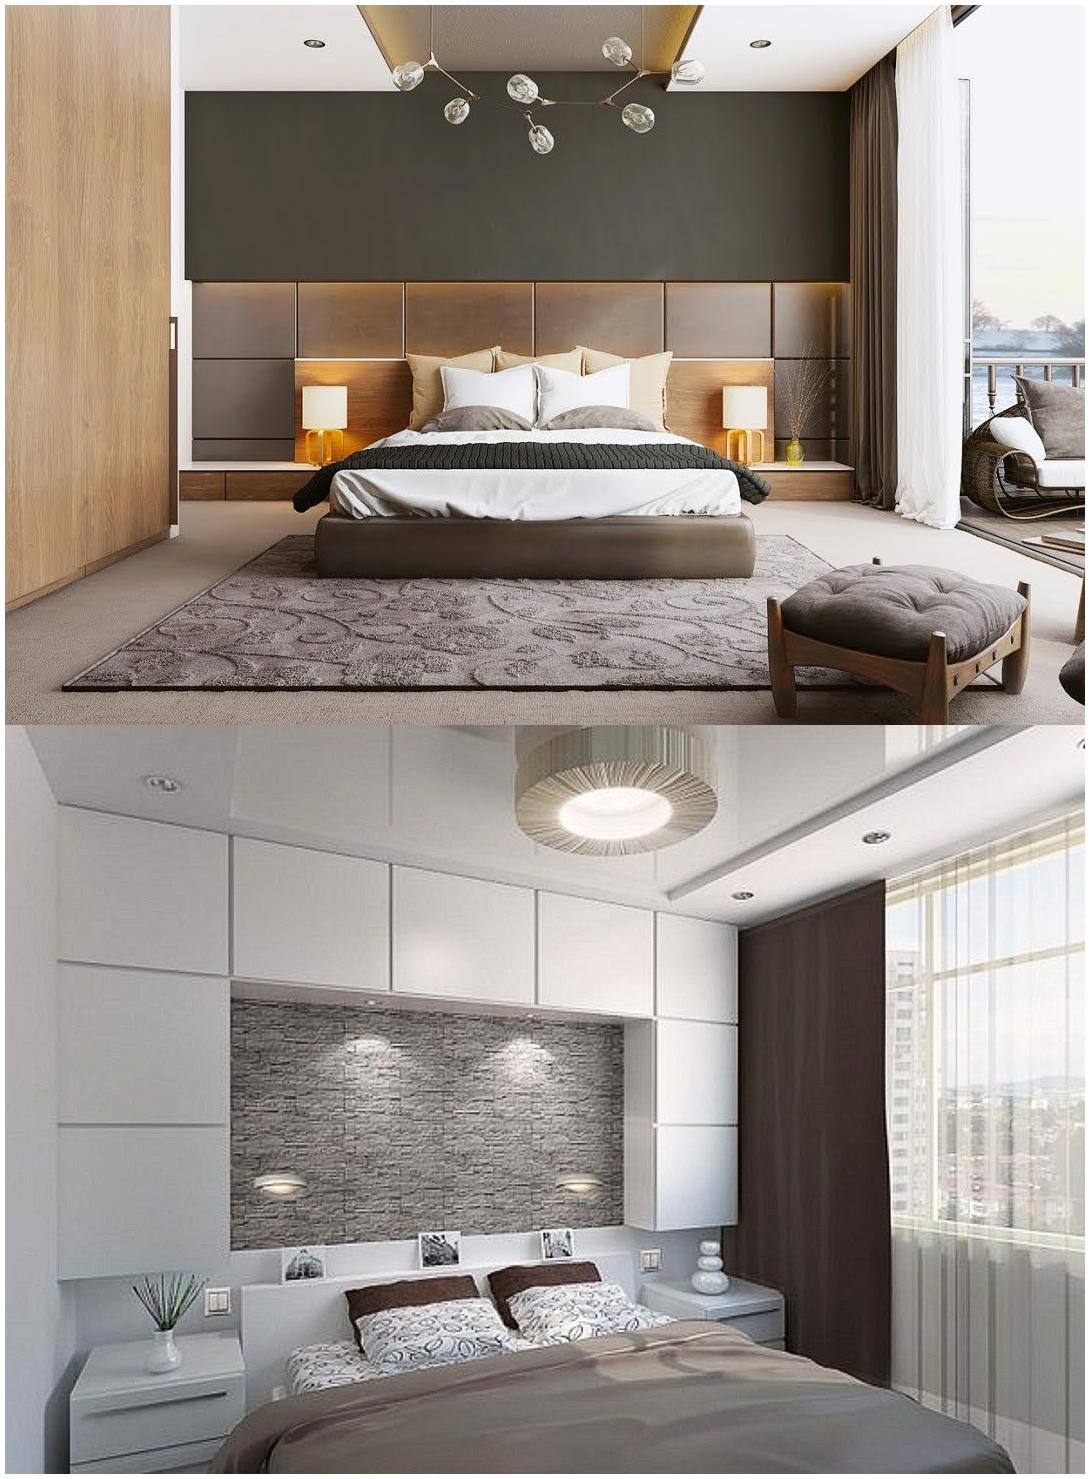 26.SIMPHOME.COM A Clever Designs of How to Make Bedroom Modern Design